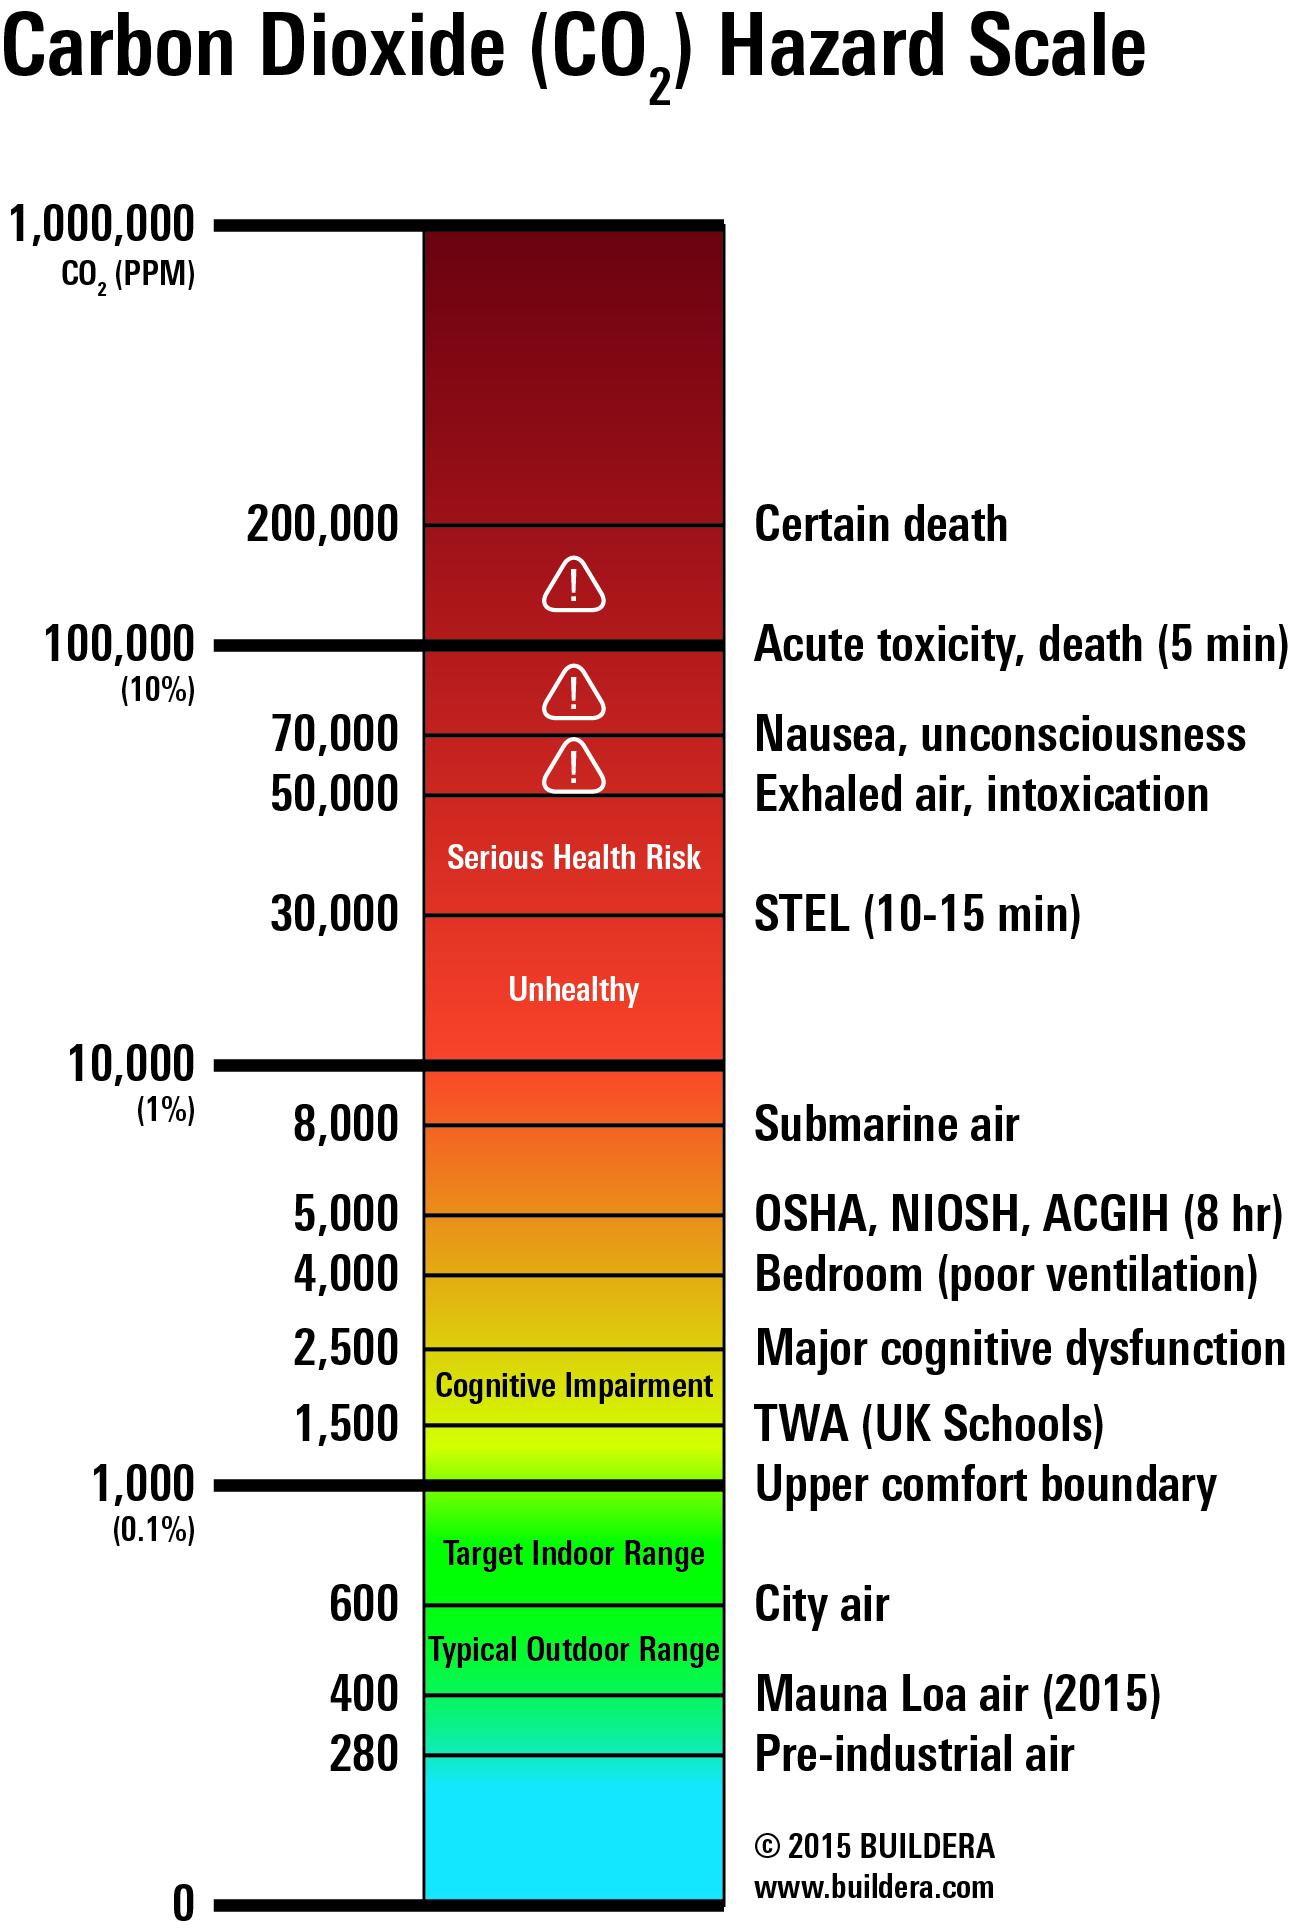 carbon-dioxide-co2-hazard-scale.jpg